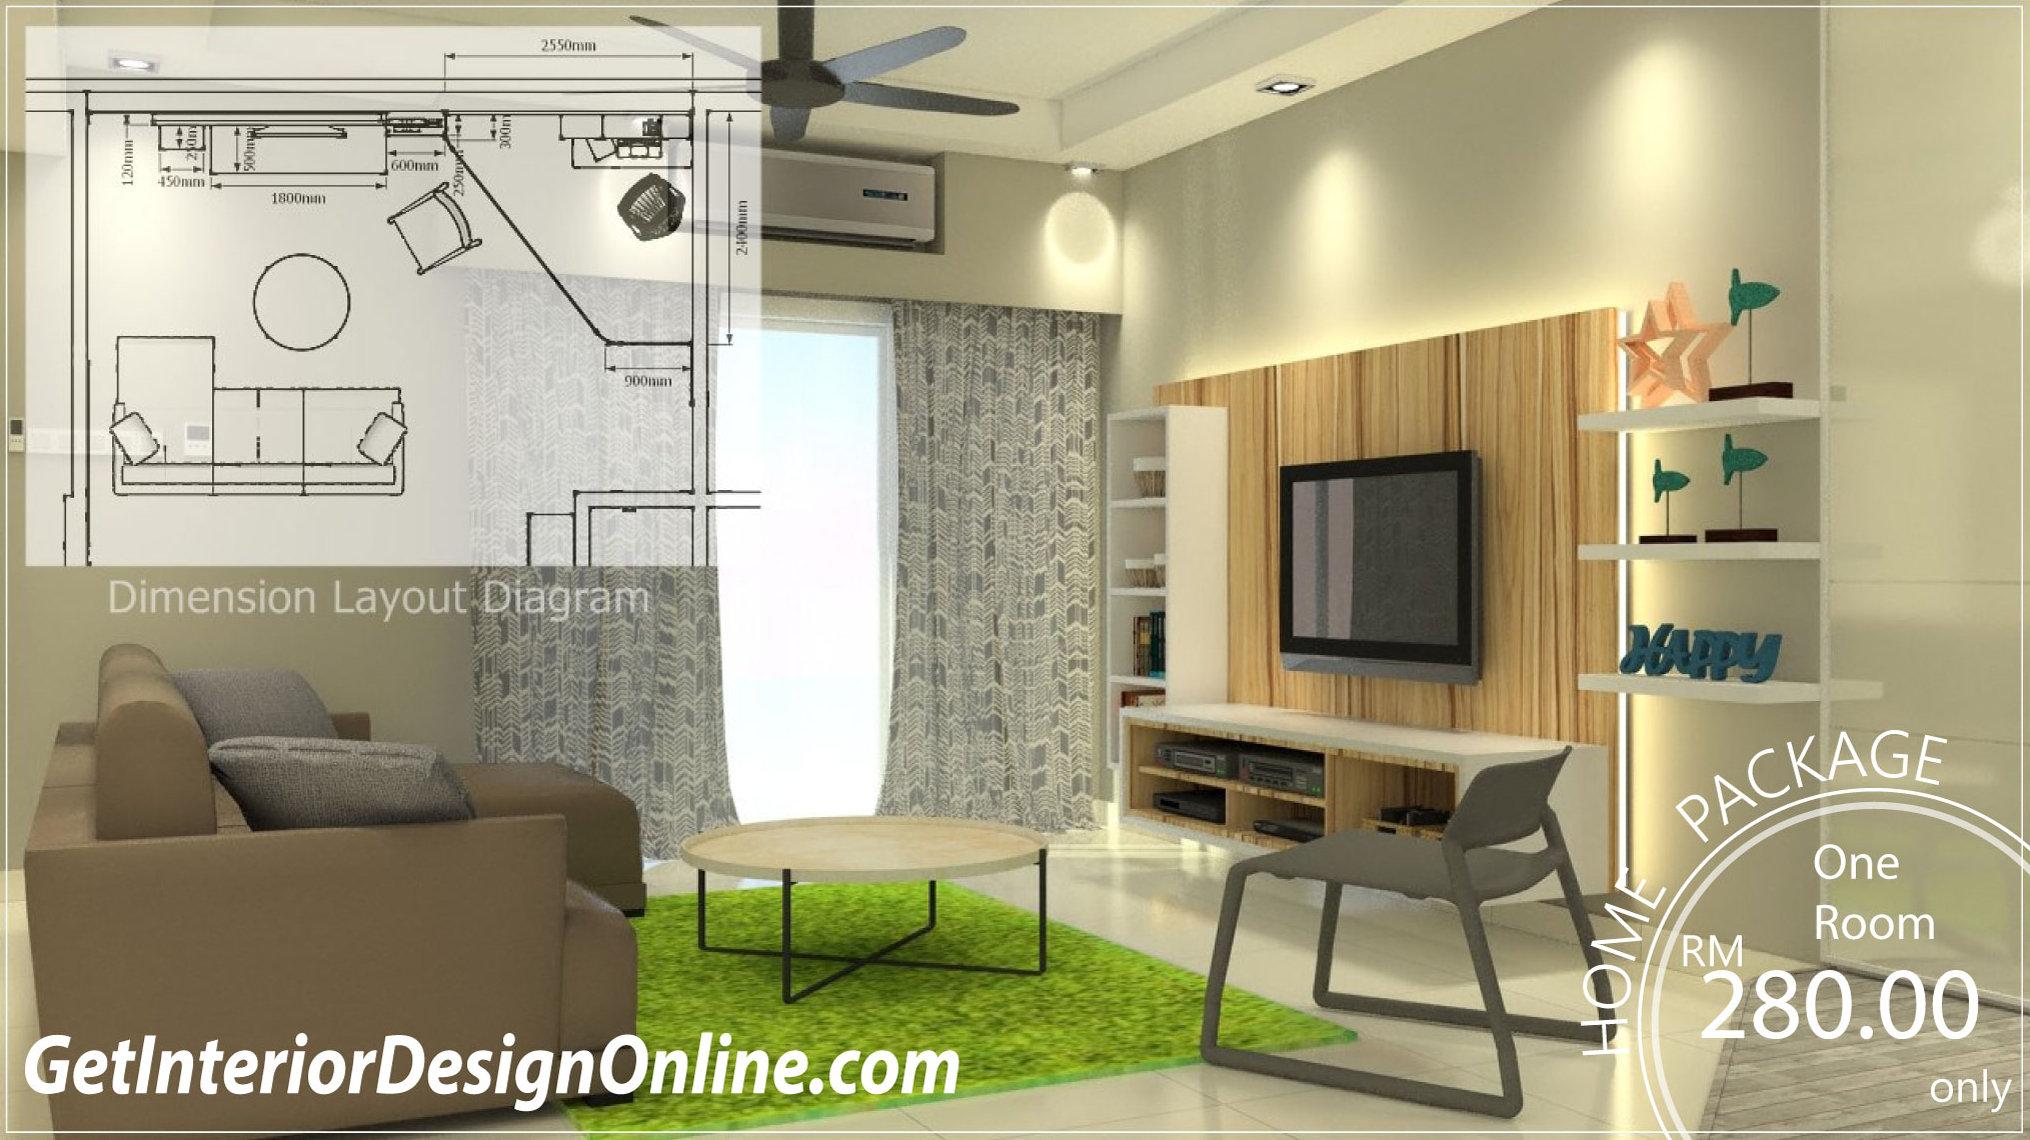 Fee Guidelines Get Interior Design Online